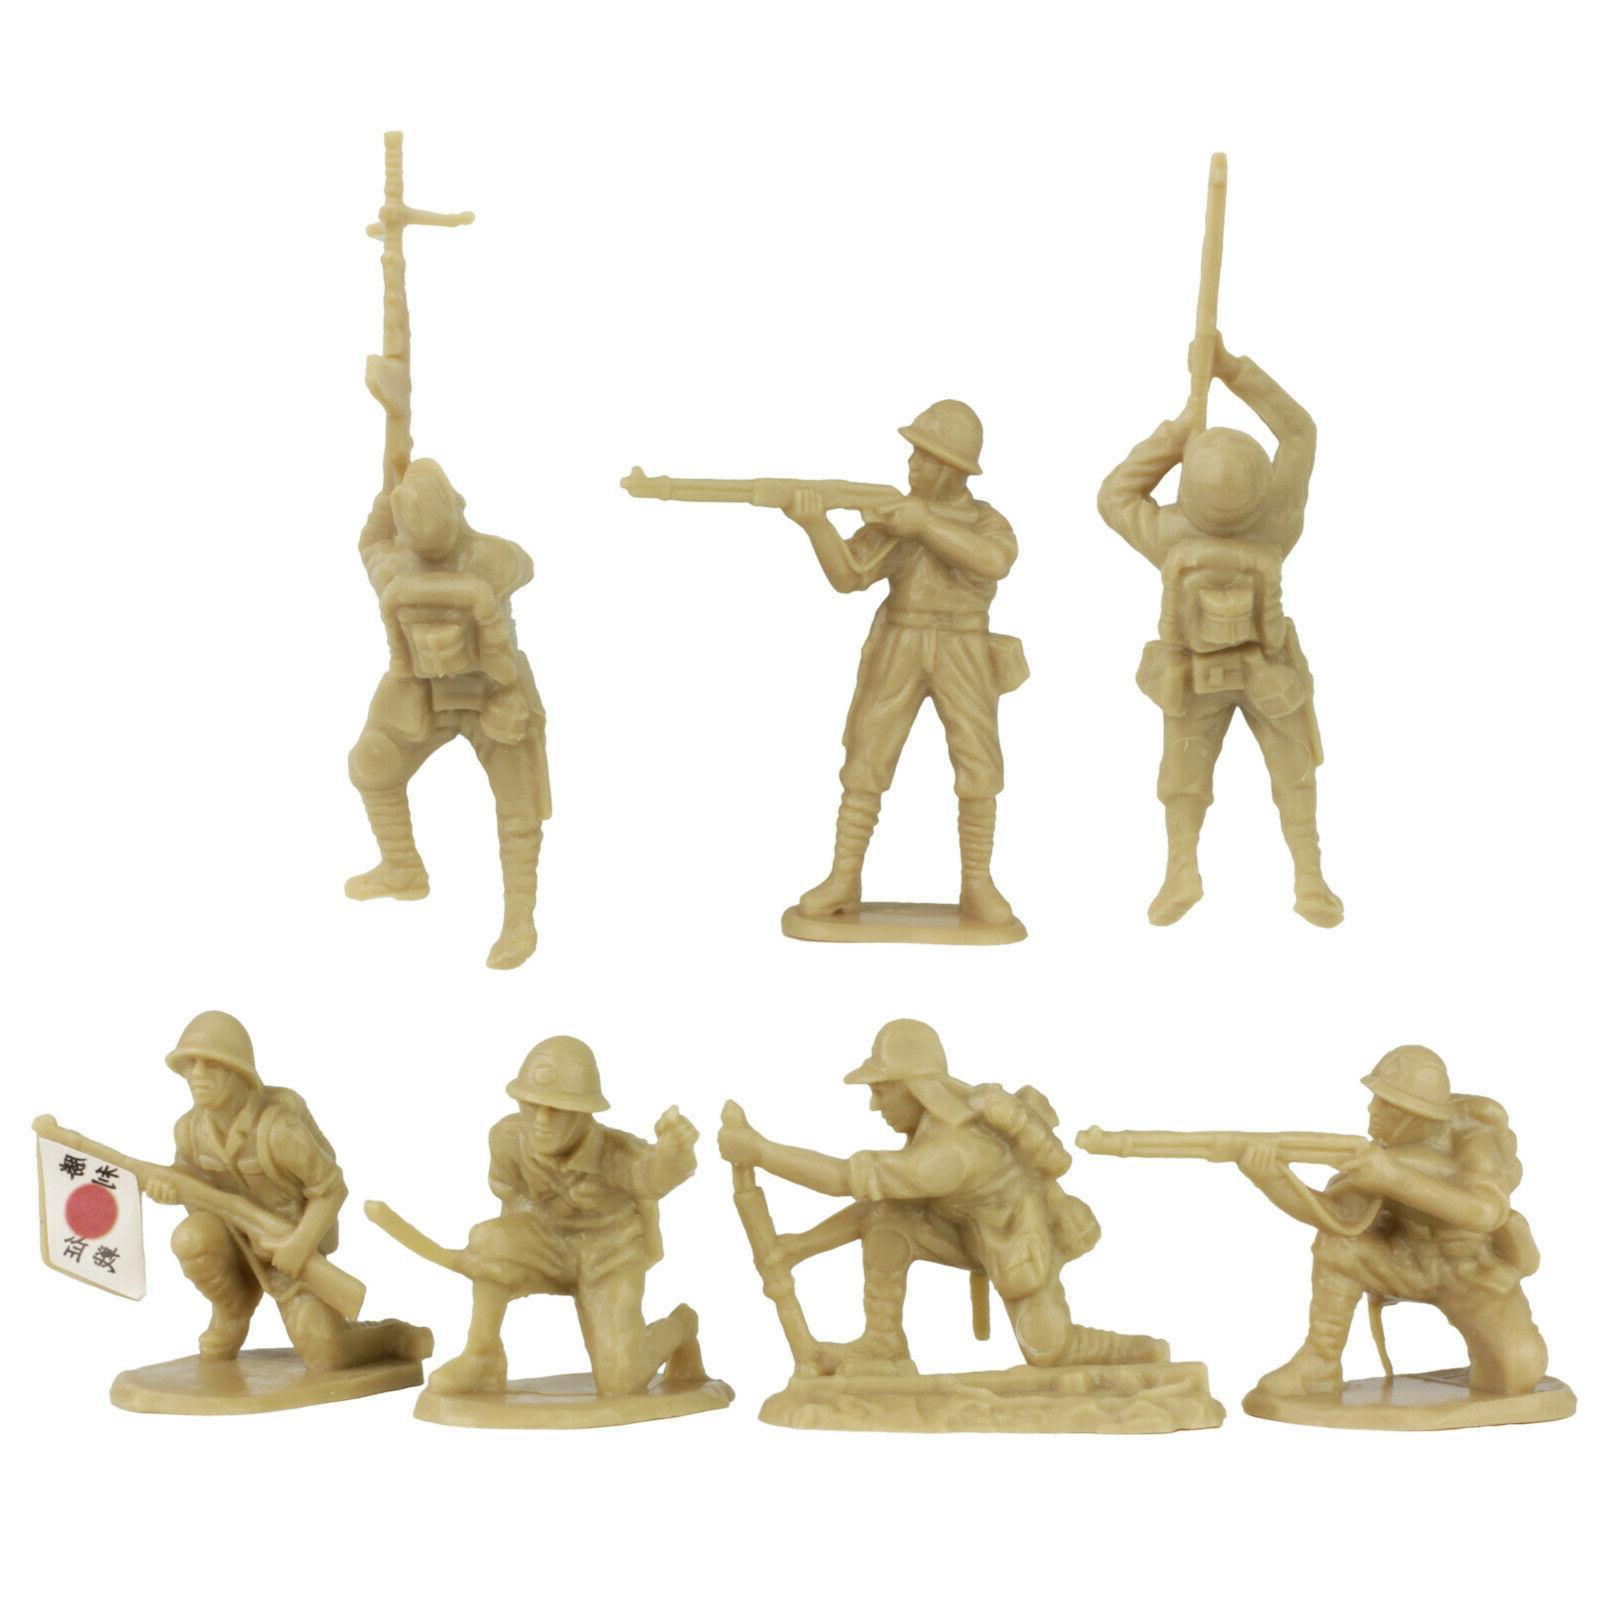 BMC Plastic Army Figures